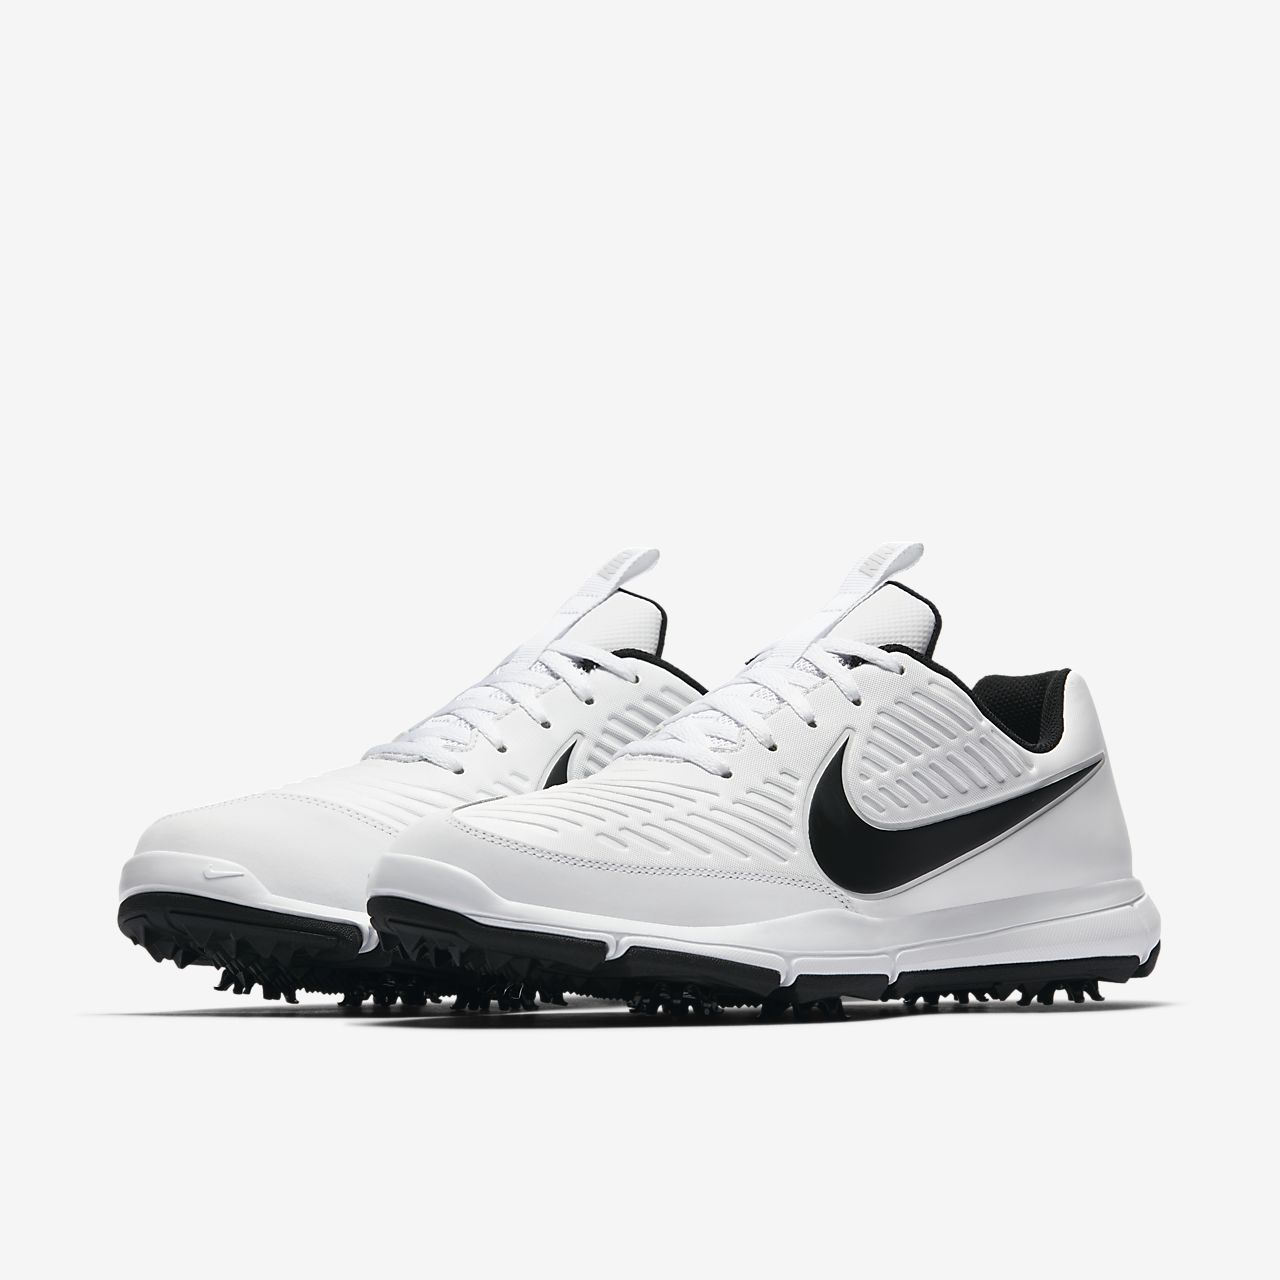 quality design e4222 5d29e ... svart vita herr Outlet  free shipping 789e8 36637 ... Golfsko Nike  Explorer 2 S för män